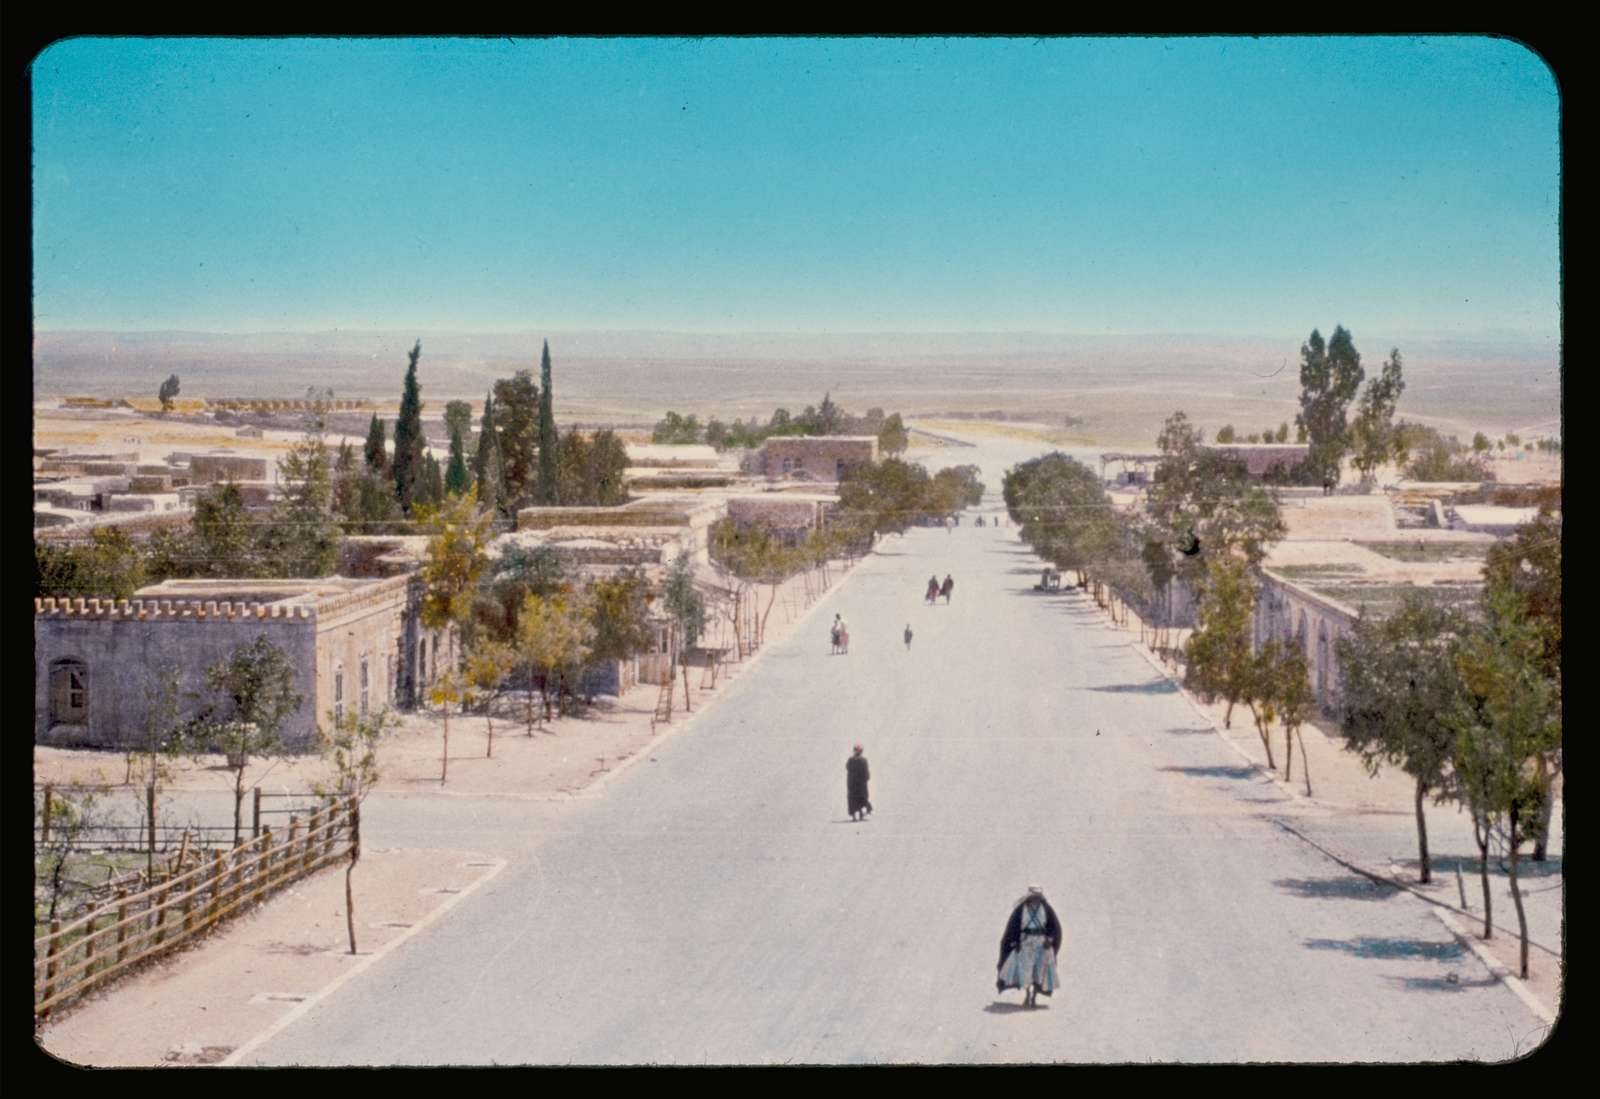 Southern Palestine, Hebron, Beersheba and Gaza area. Beersheba, the main street